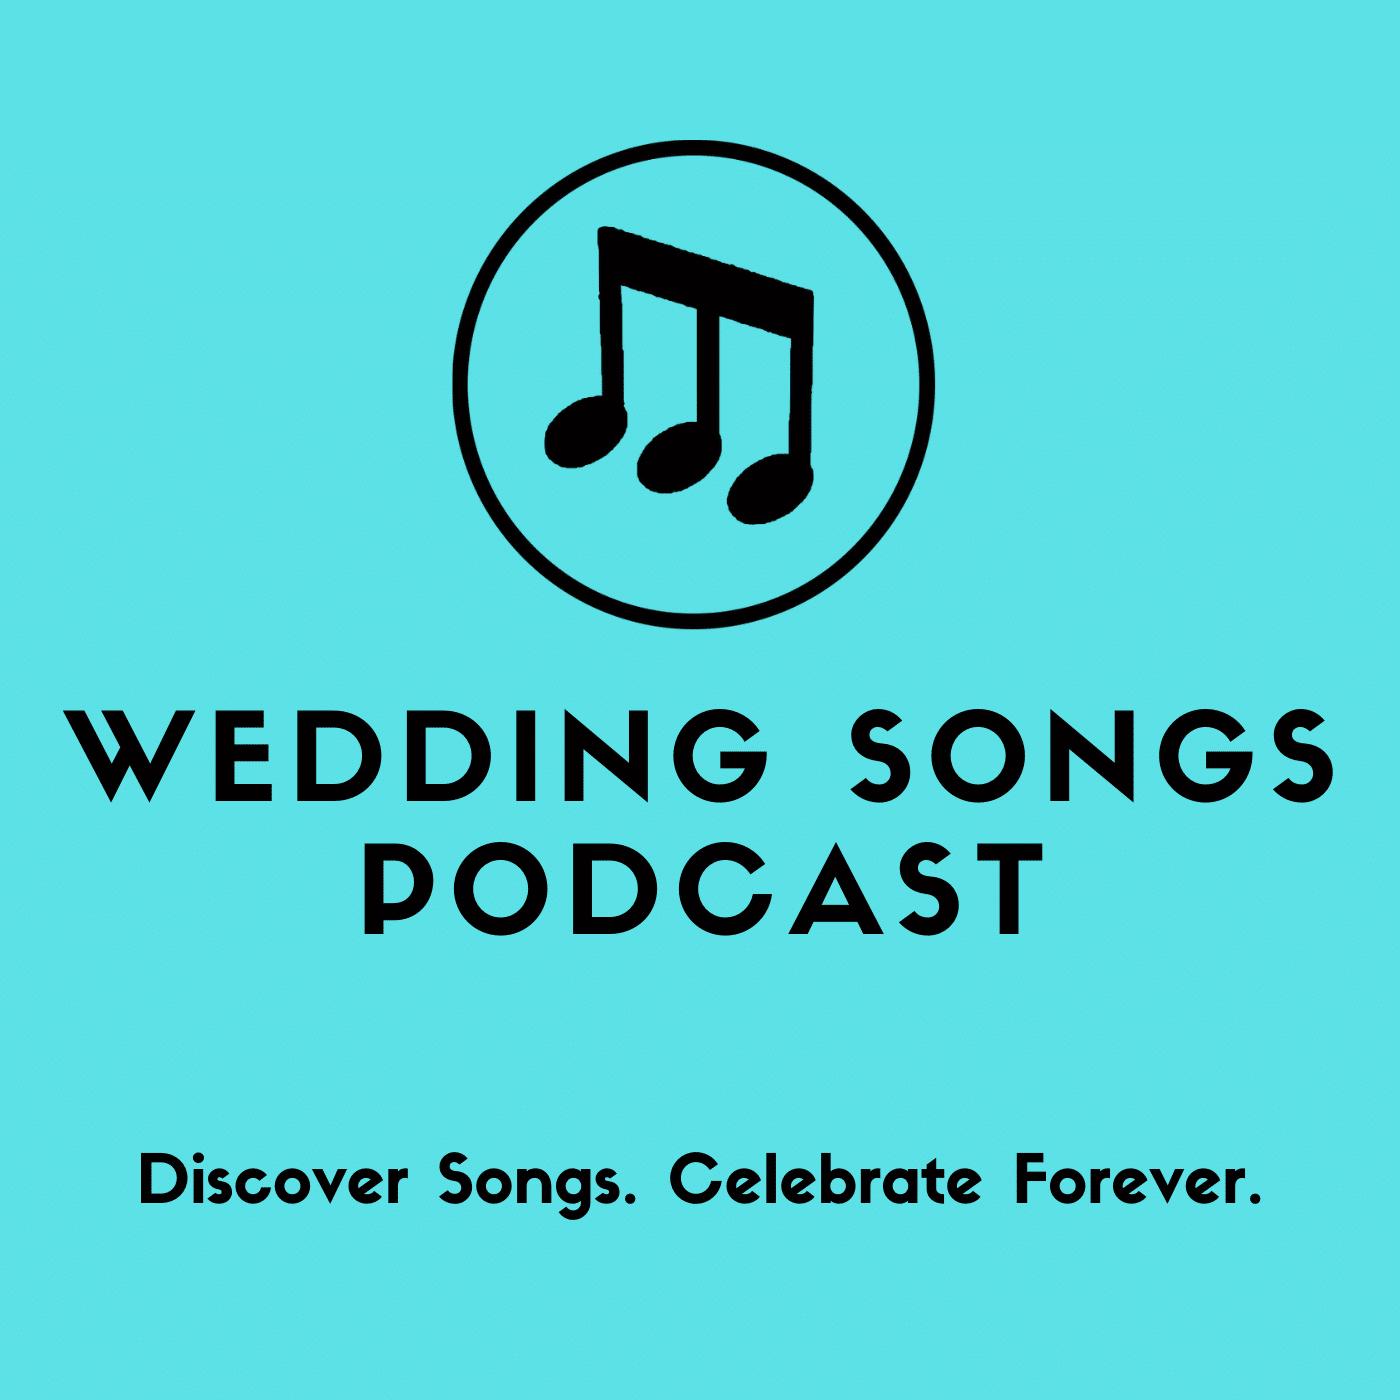 Wedding Songs Podcast Logo